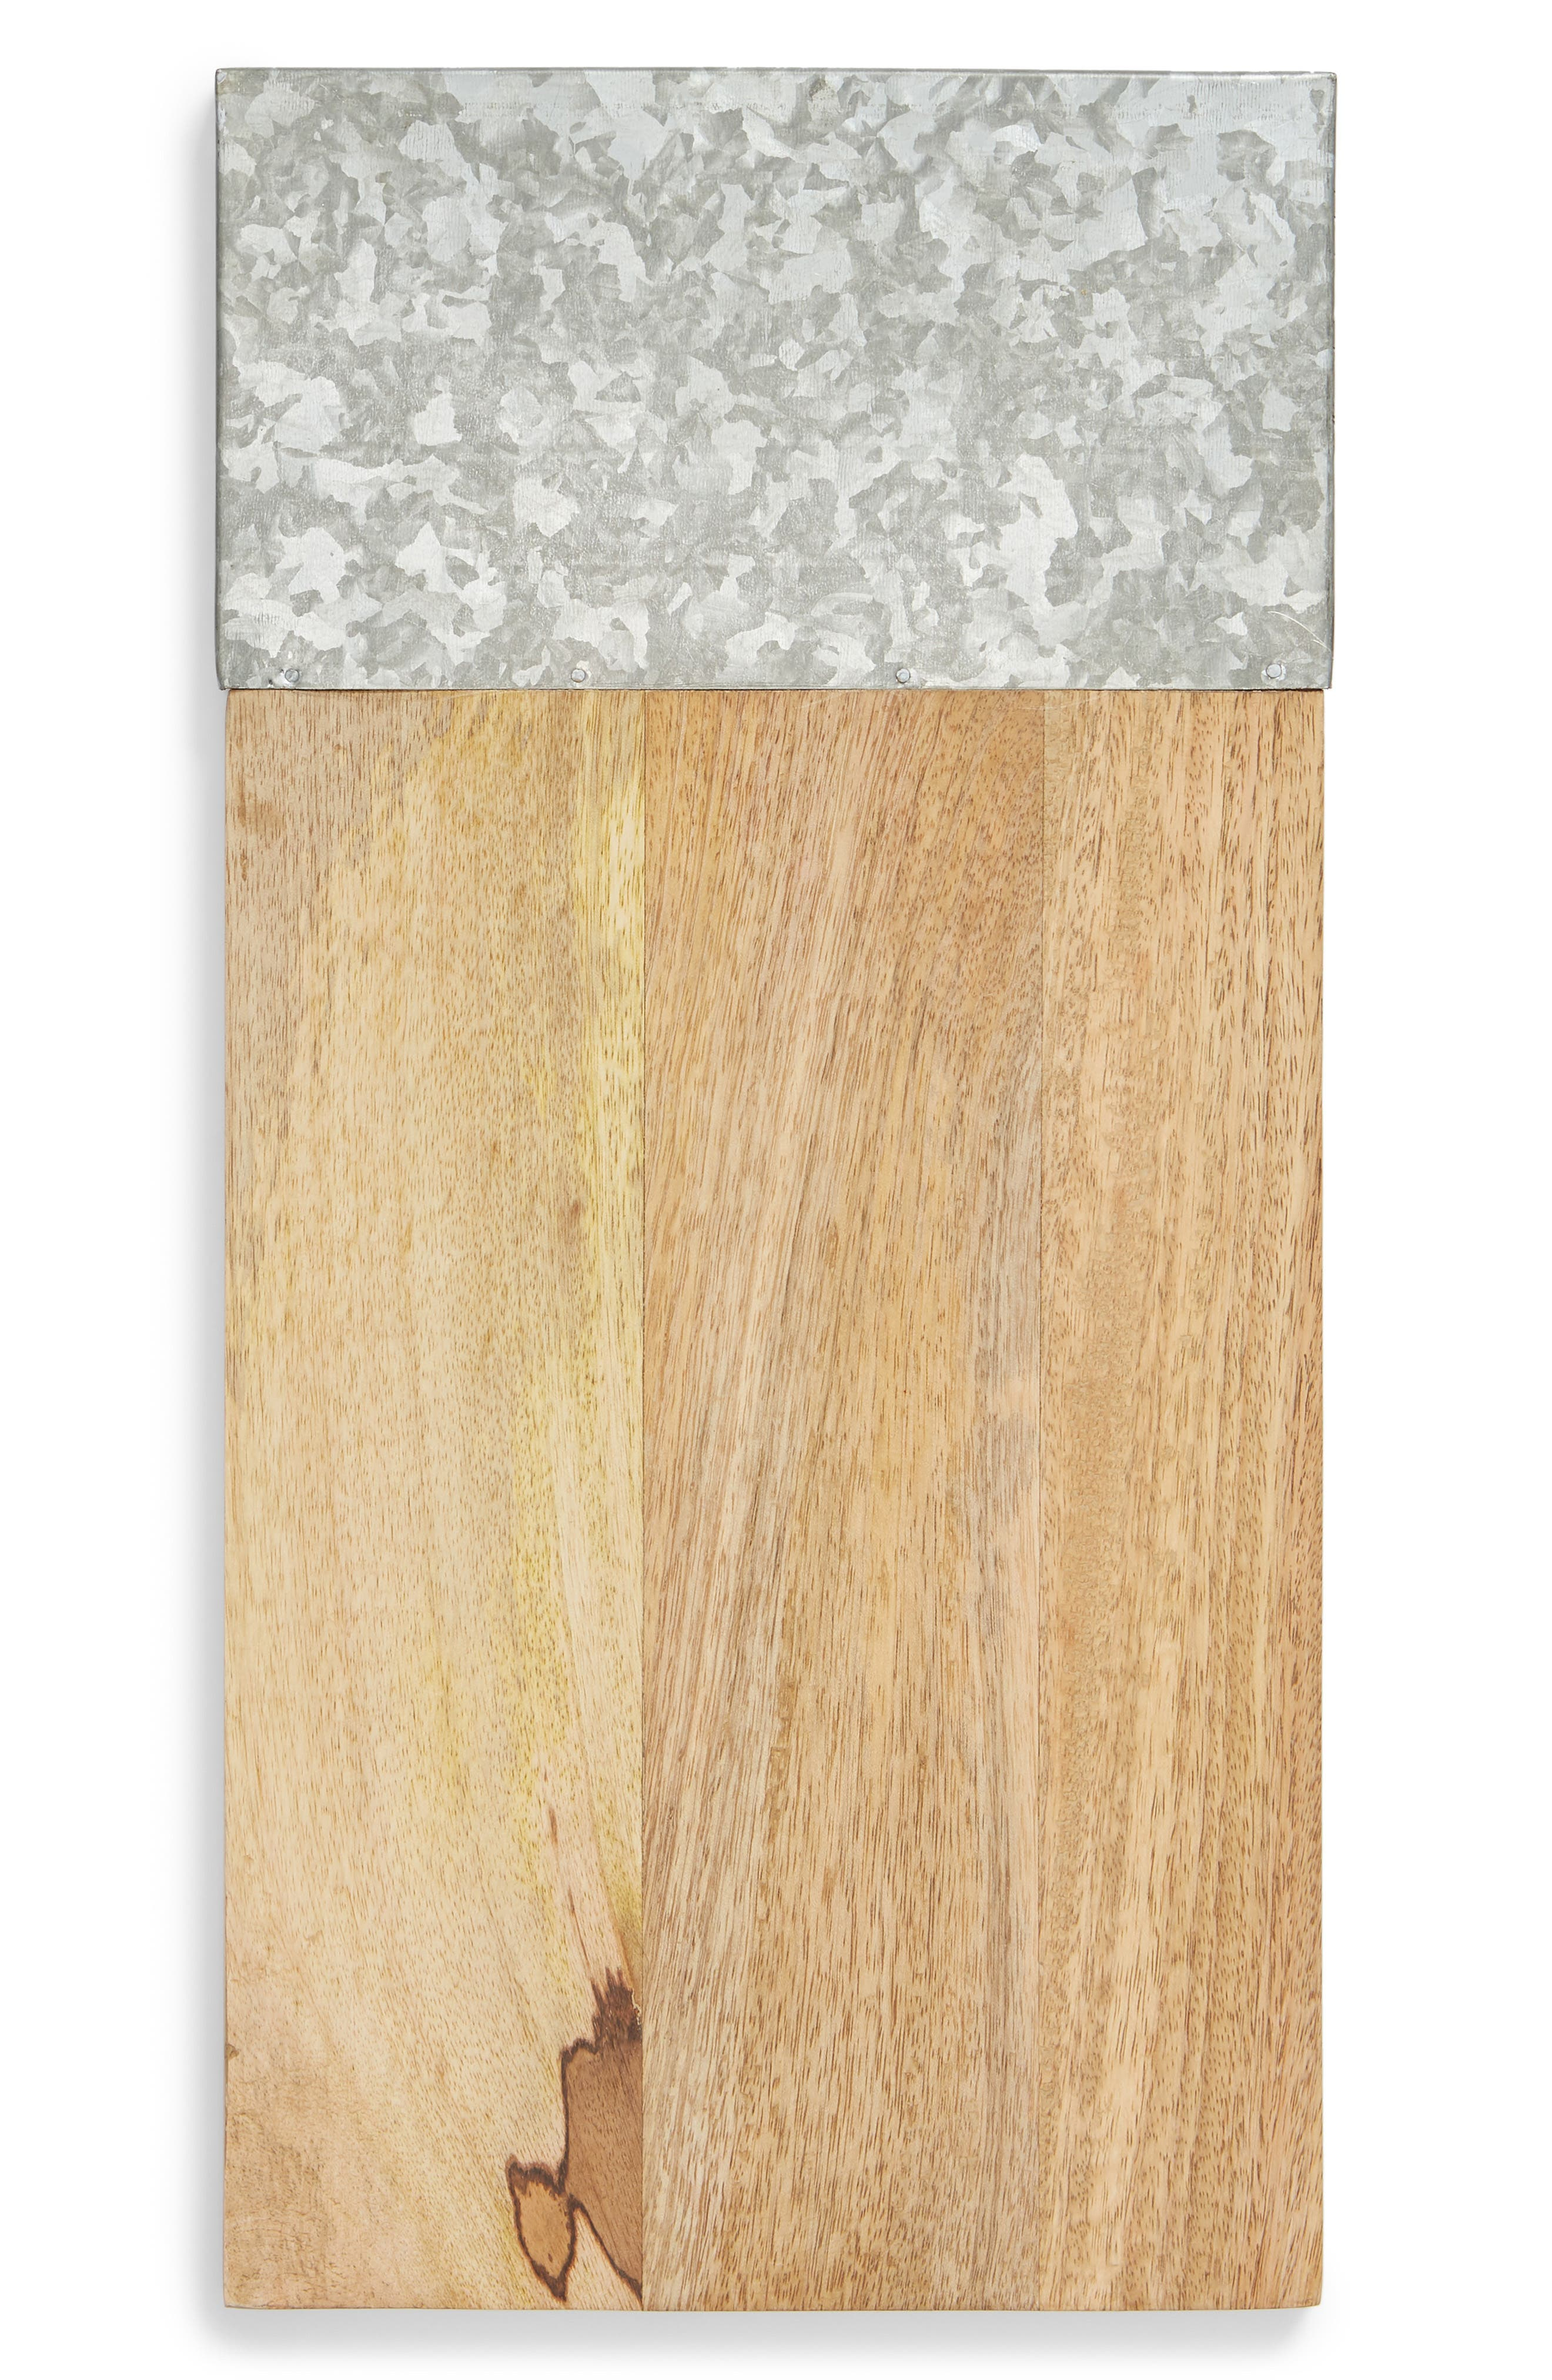 Wood & Galvanized Iron Serving Board,                             Main thumbnail 1, color,                             GREY